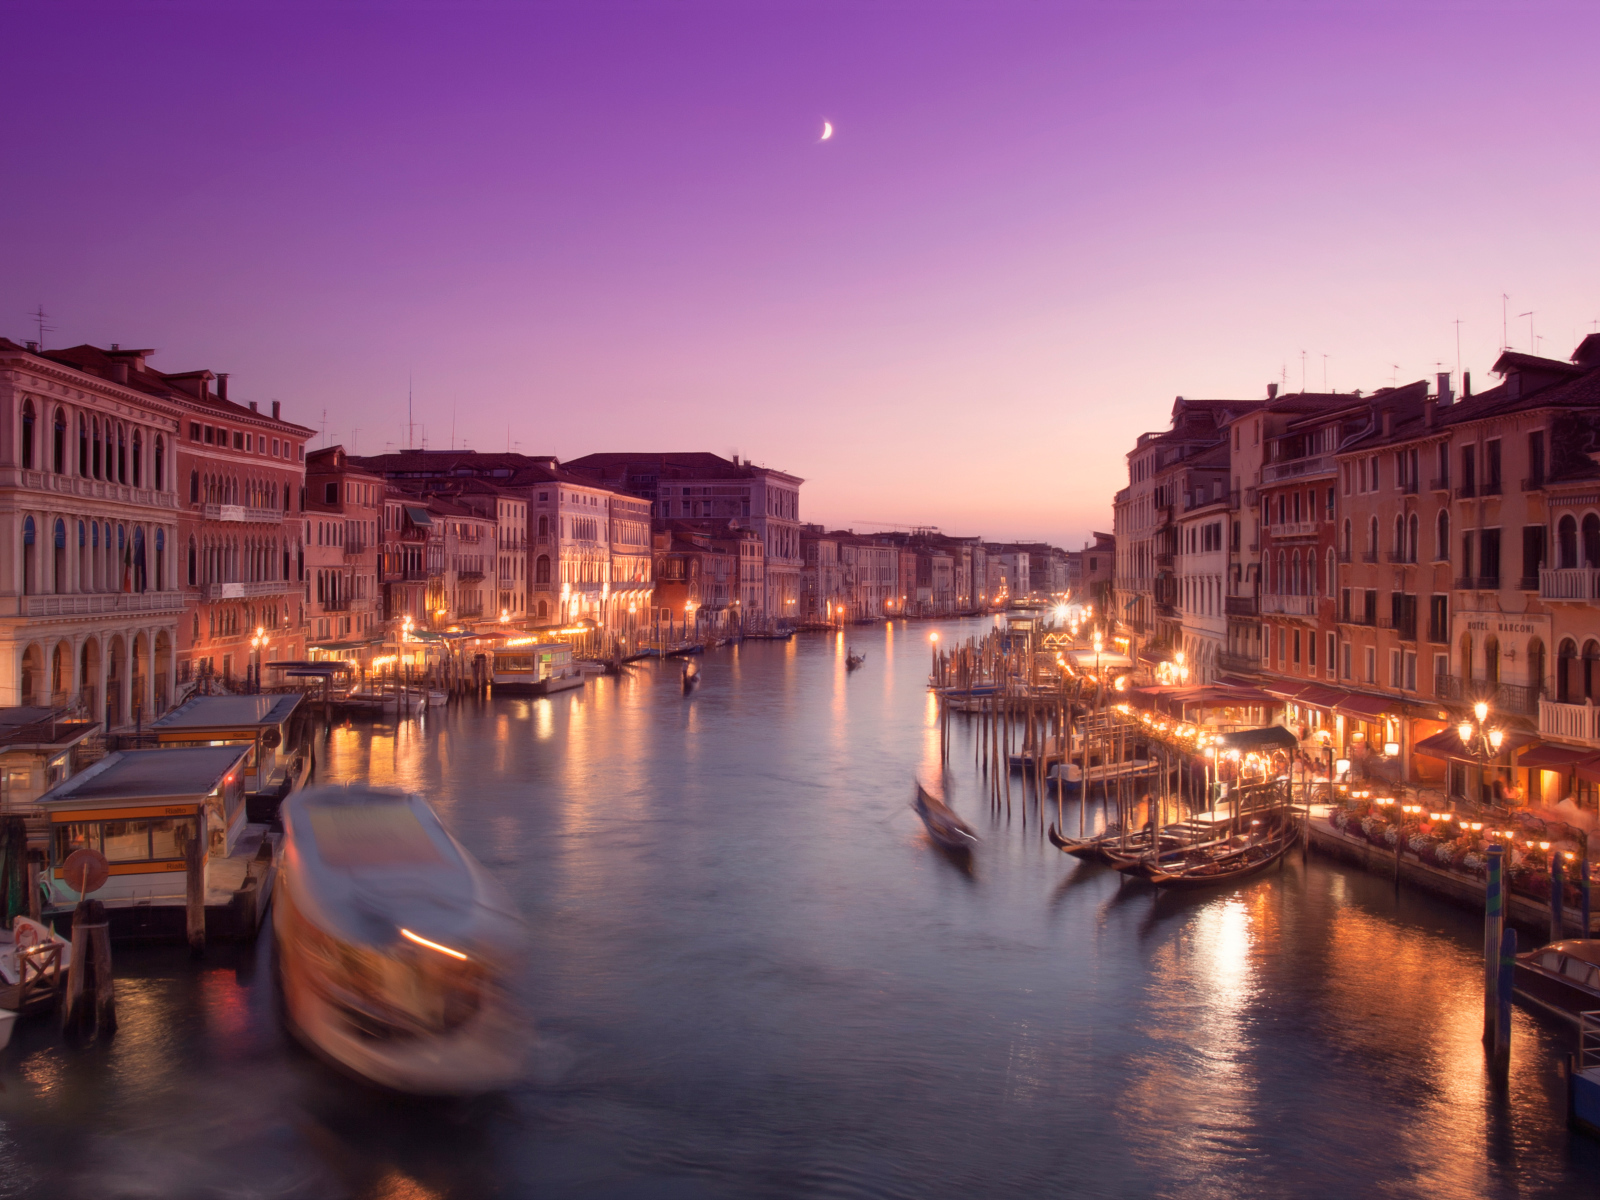 Beauty of Venice Italy Desktop wallpapers 1600x1200 1600x1200